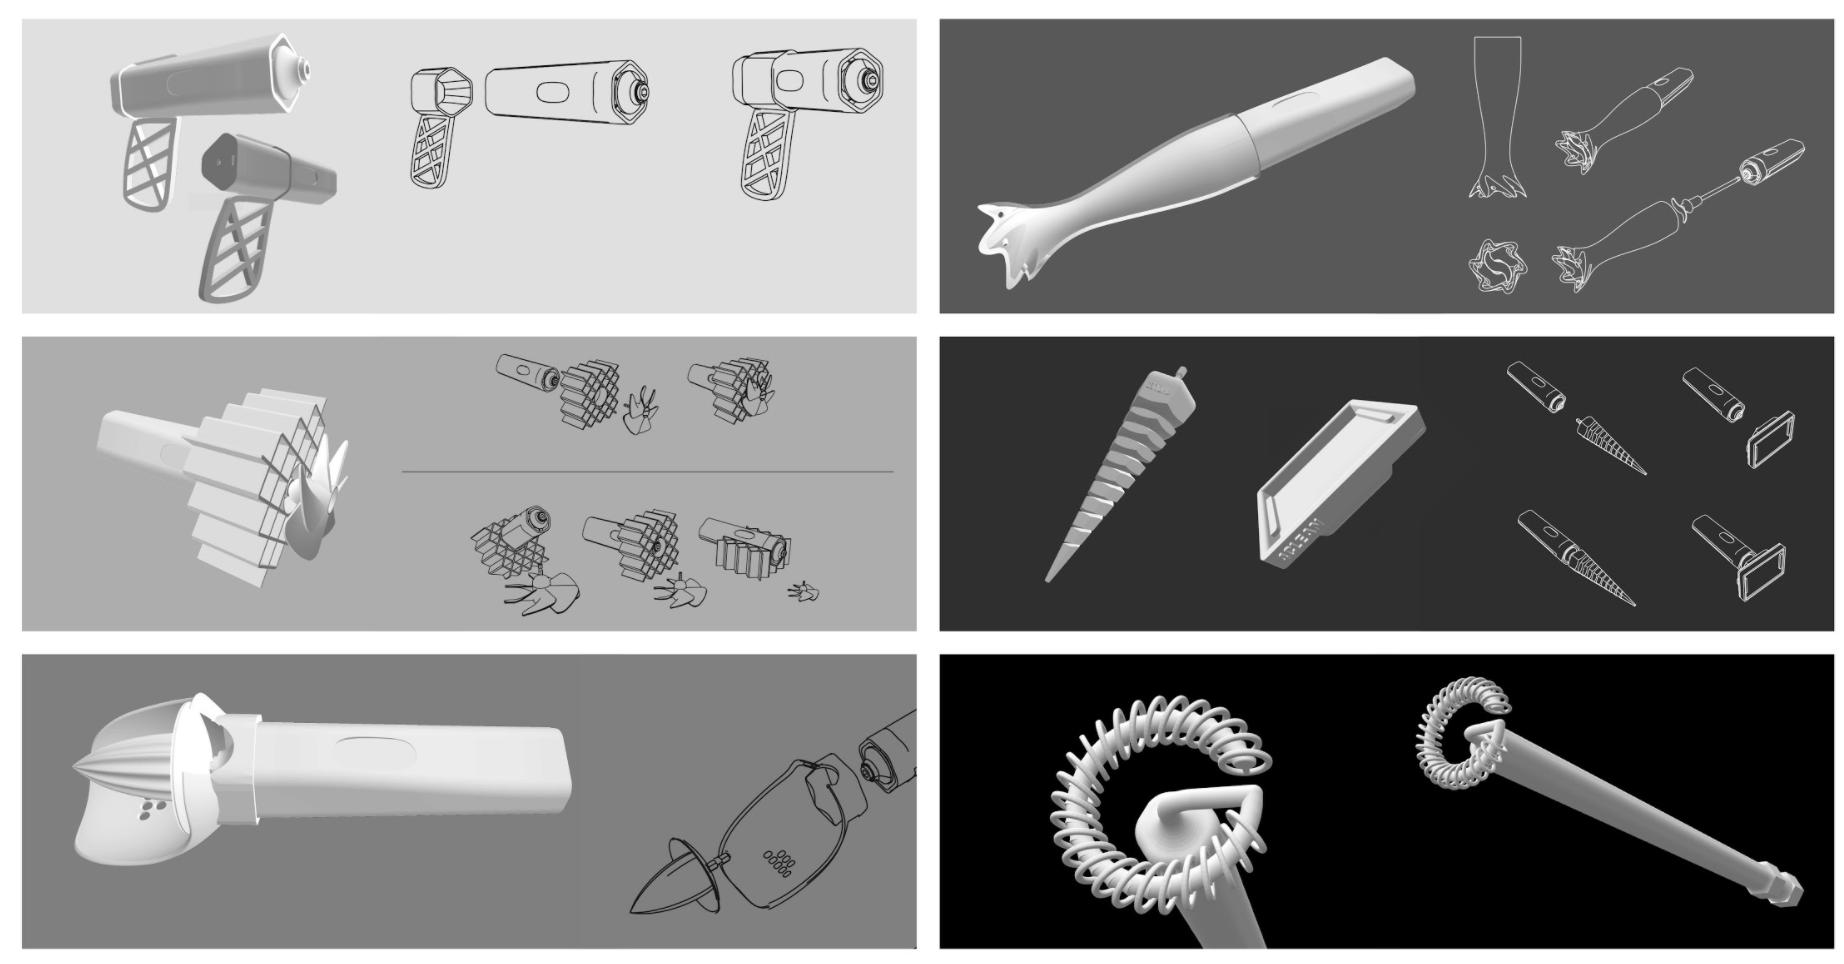 Design components